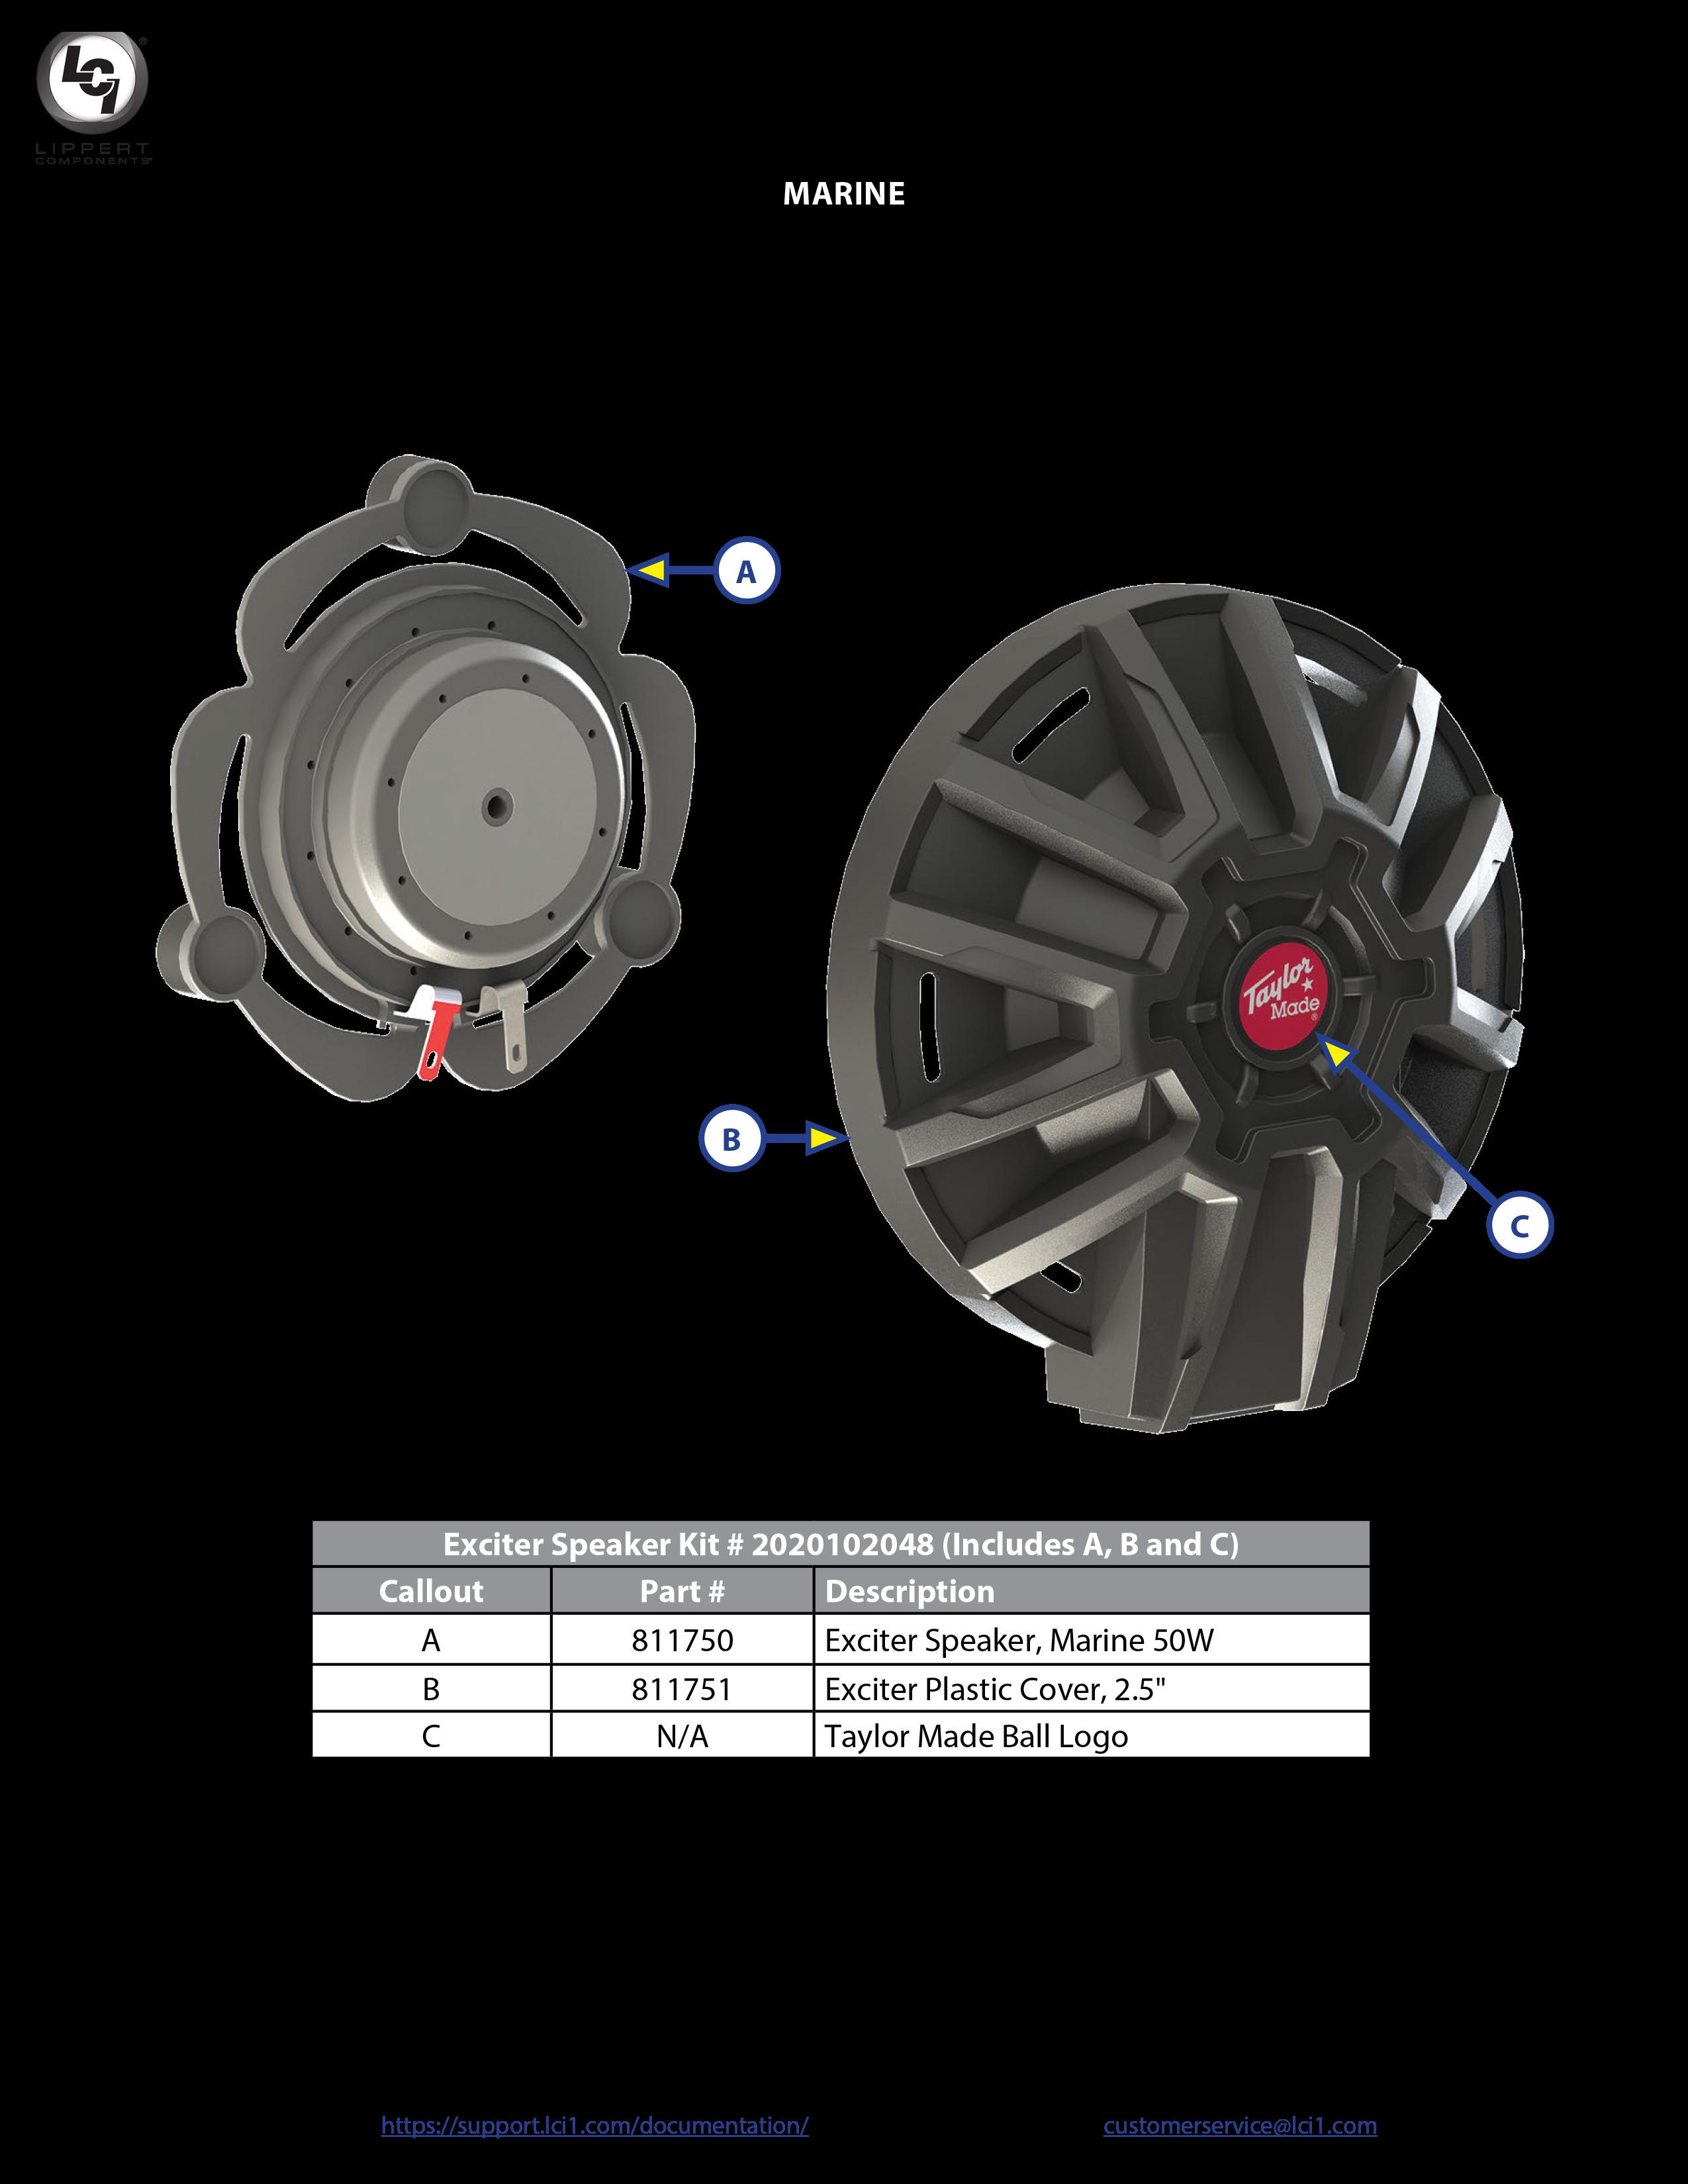 Taylor Made® Exciter Speaker Components